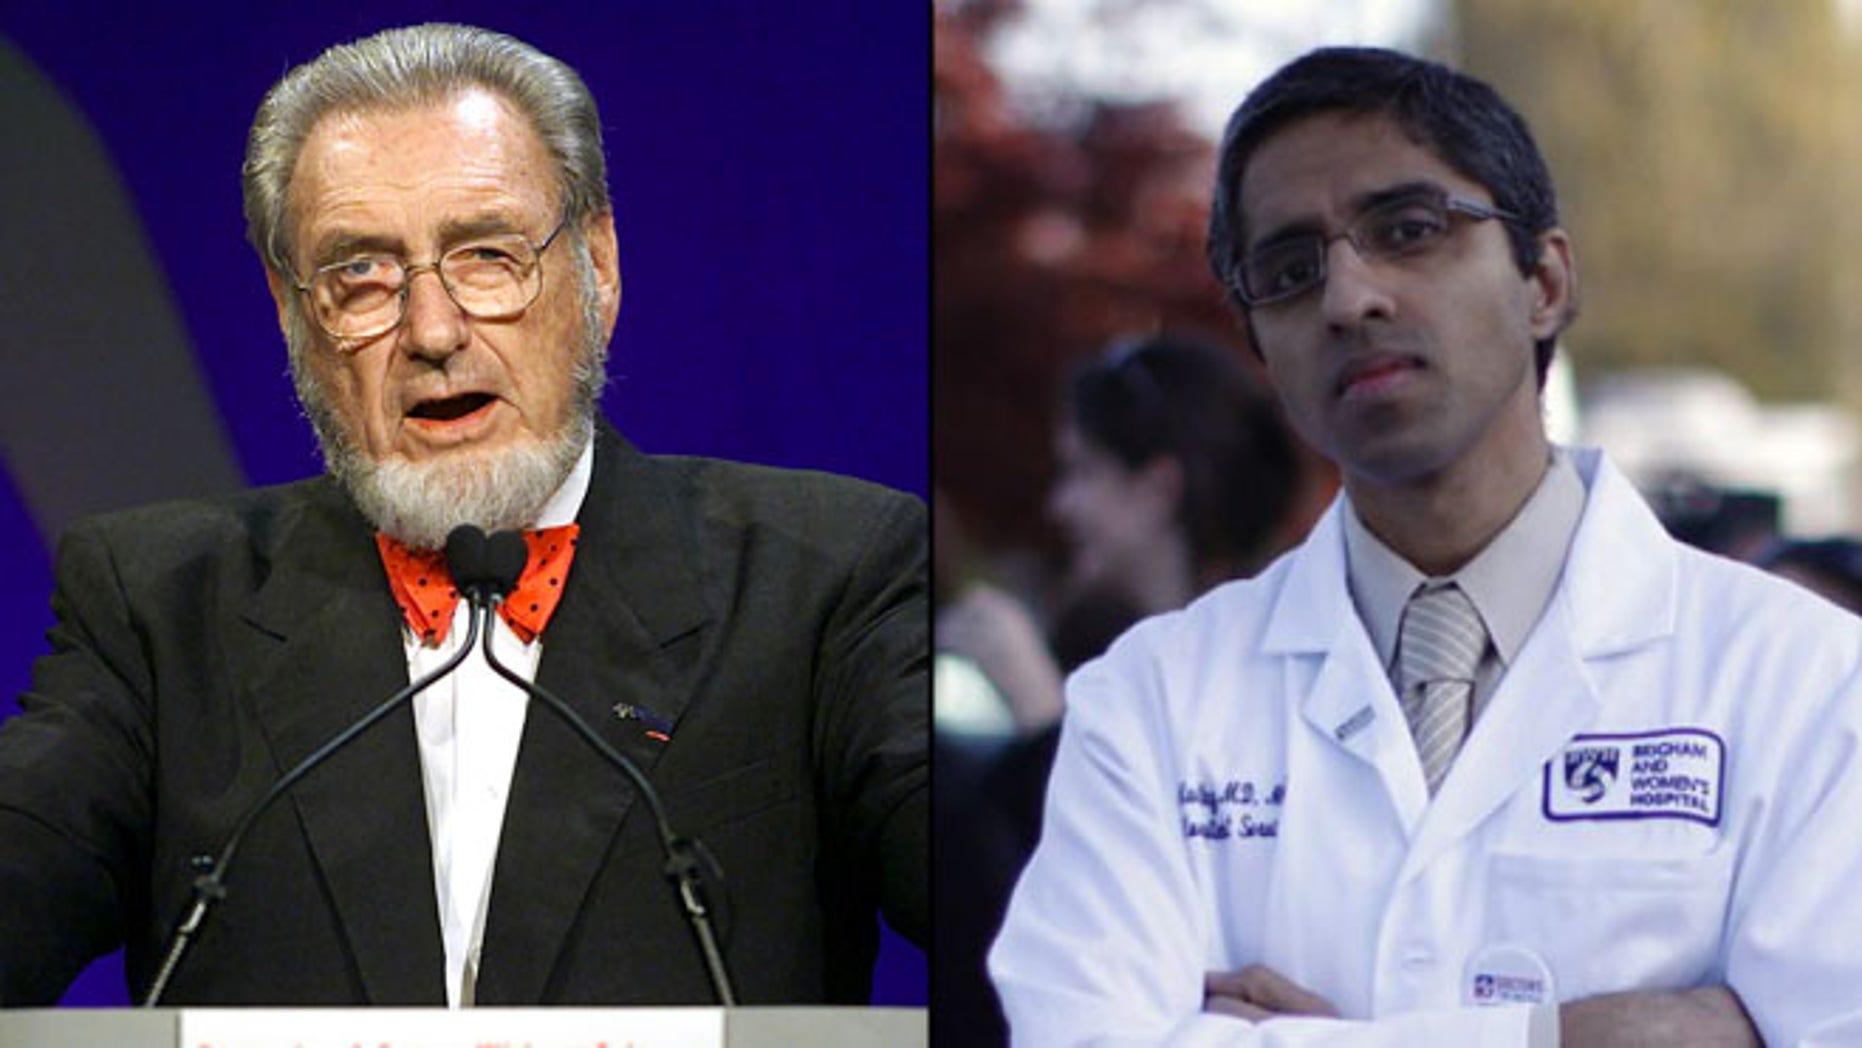 Shown here are former U.S. Surgeon General C. Everett Koop, left, and surgeon general nominee Vivek Murthy.